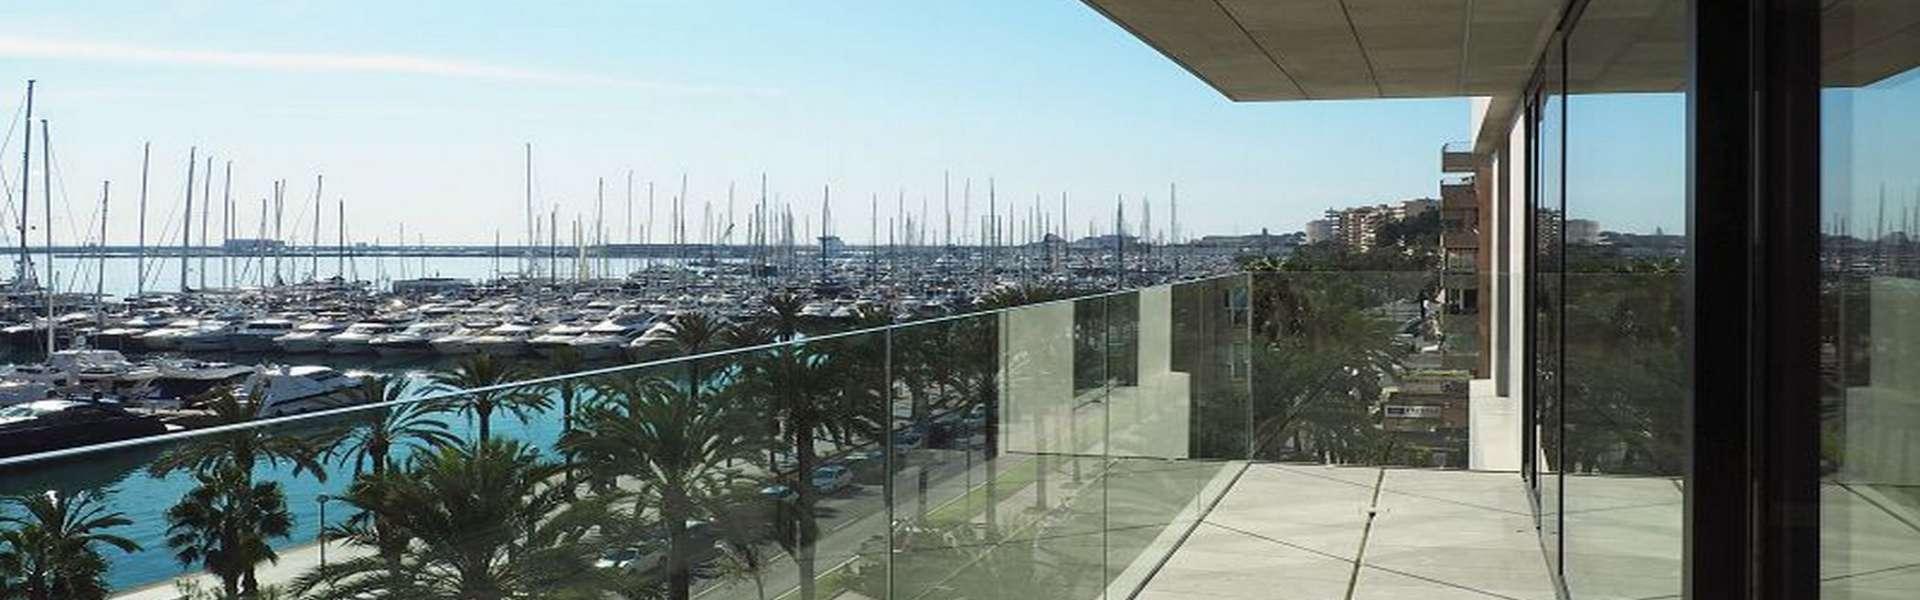 Palma/Paseo Marítimo - Luxuriöses Apartment mit modernem Design und spektakulärem Ausblick